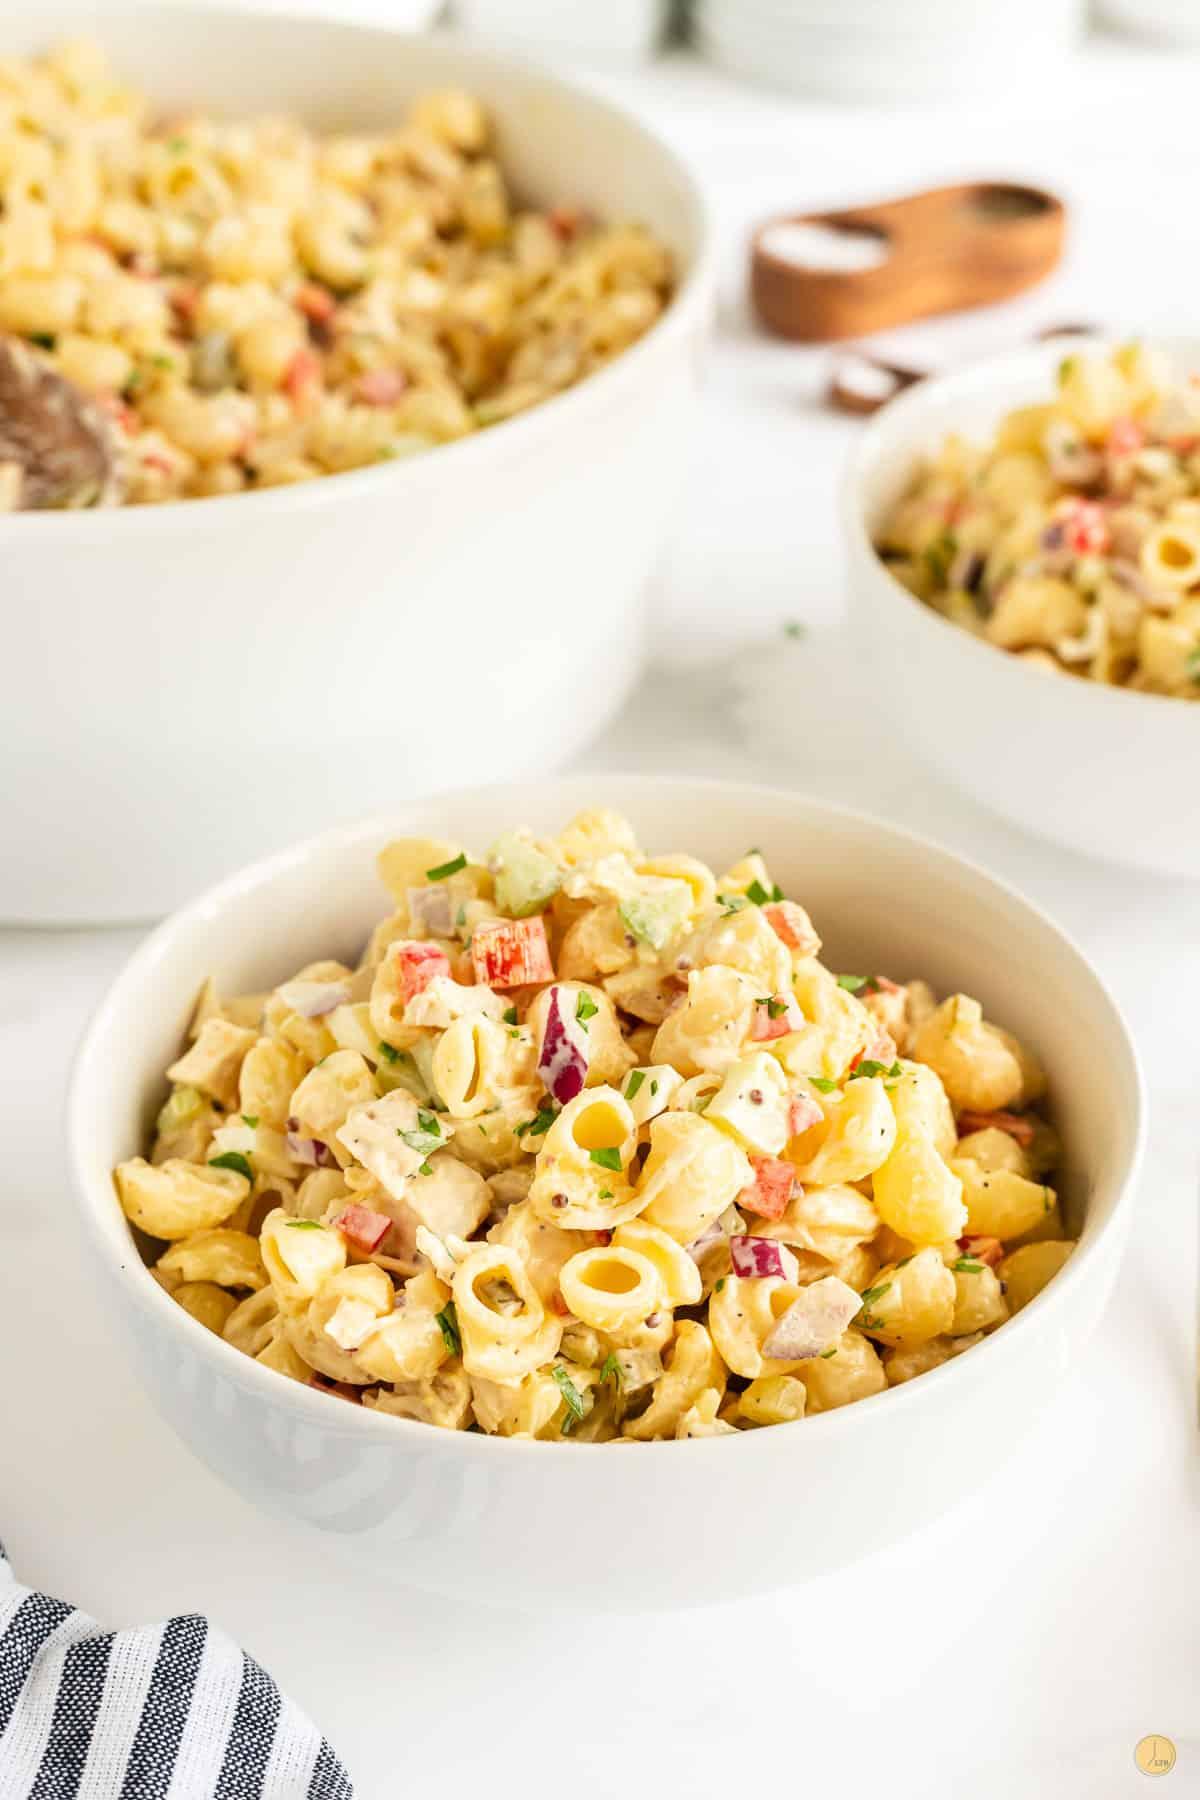 three bowls of macaroni salad